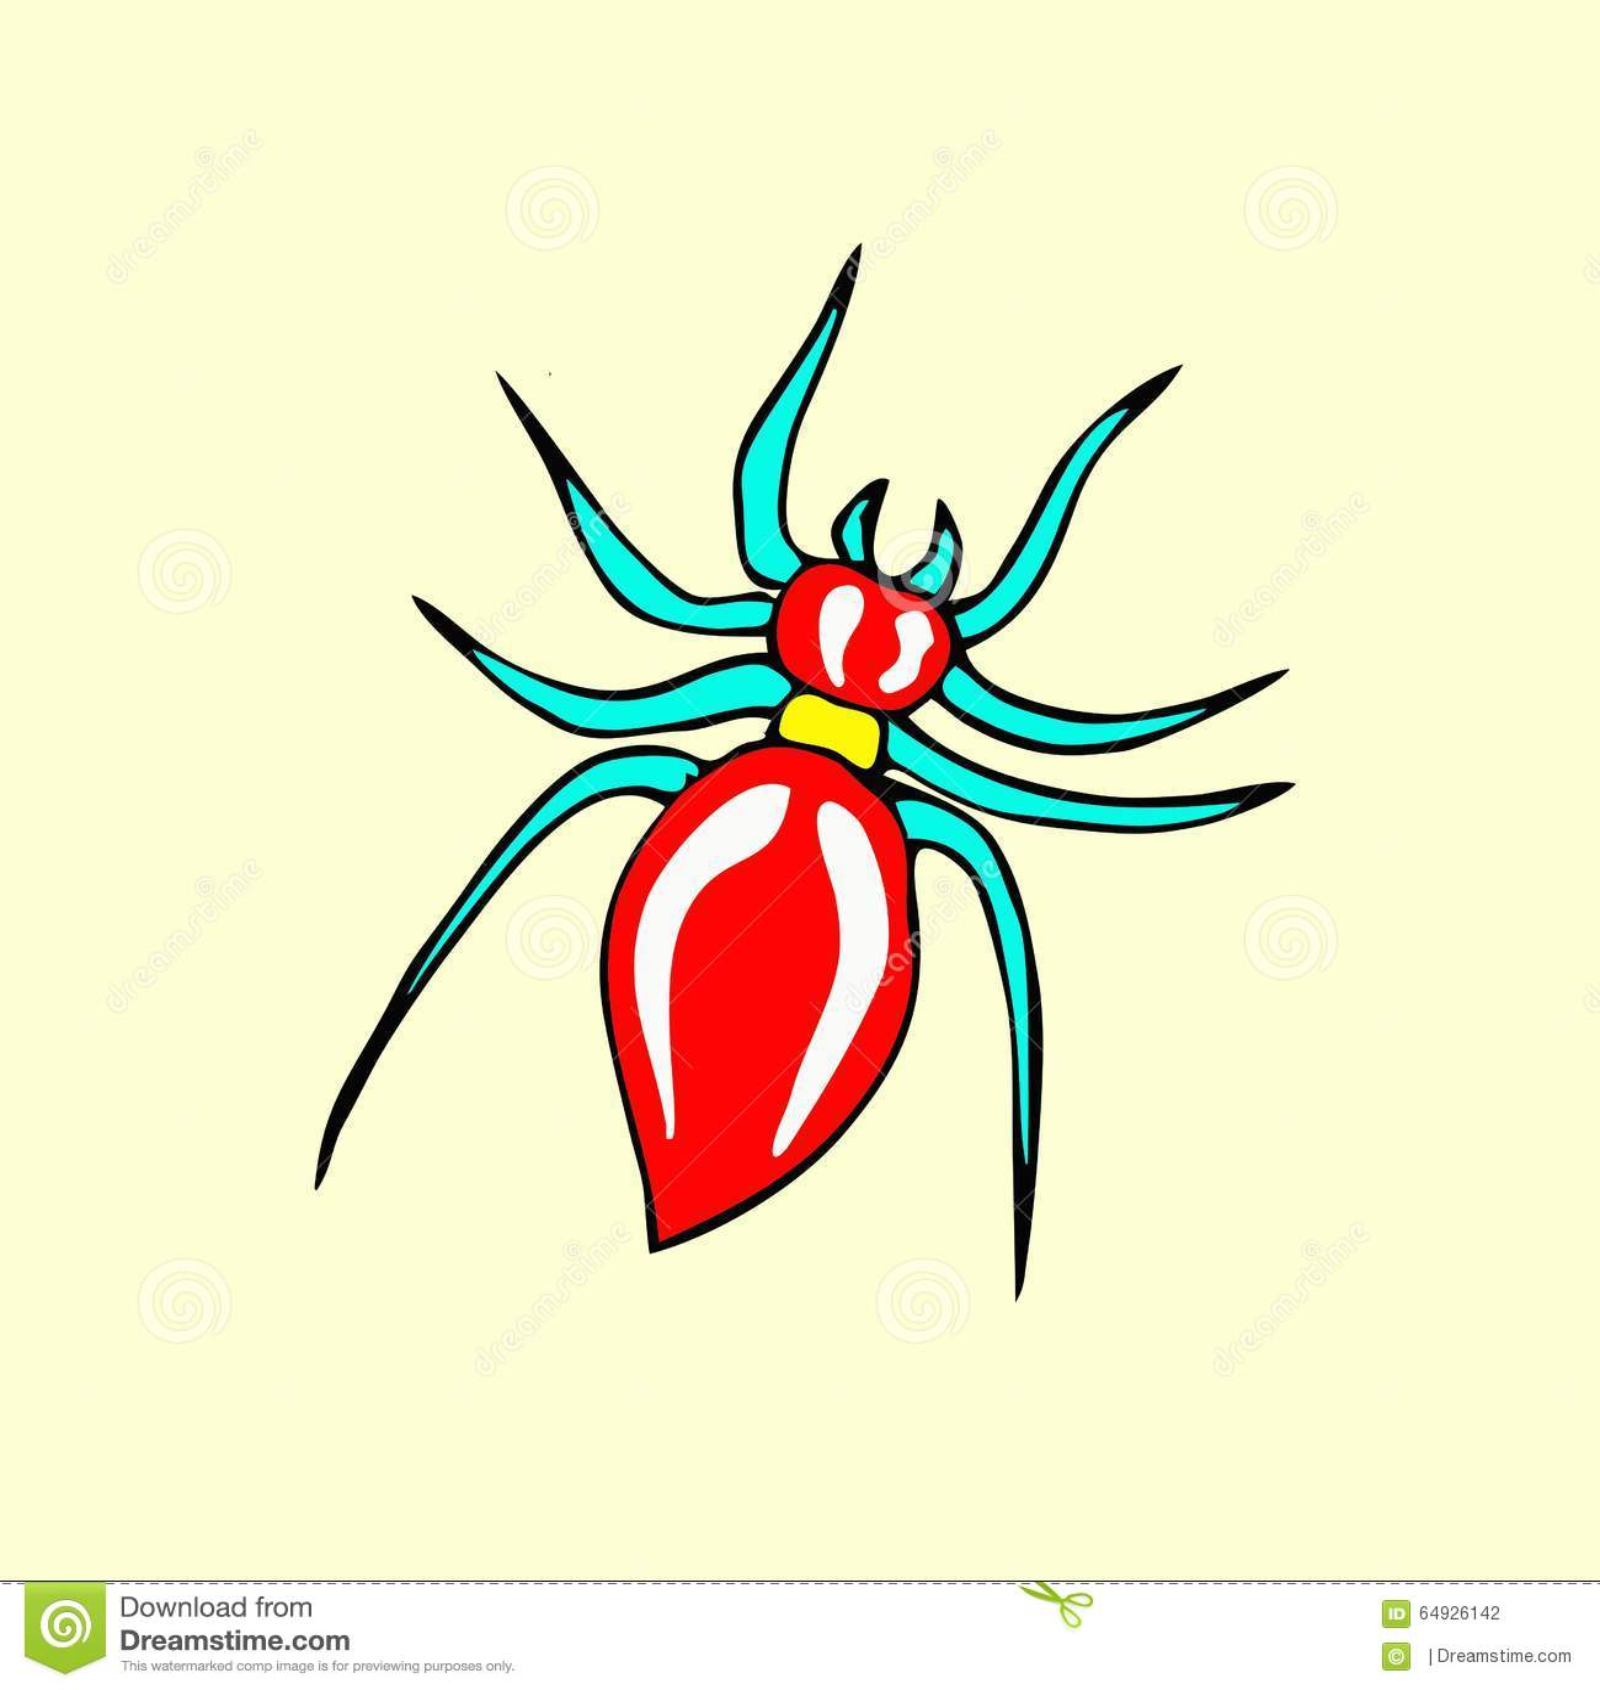 Spider Cartoon Stock Illustration - Image: 64926142